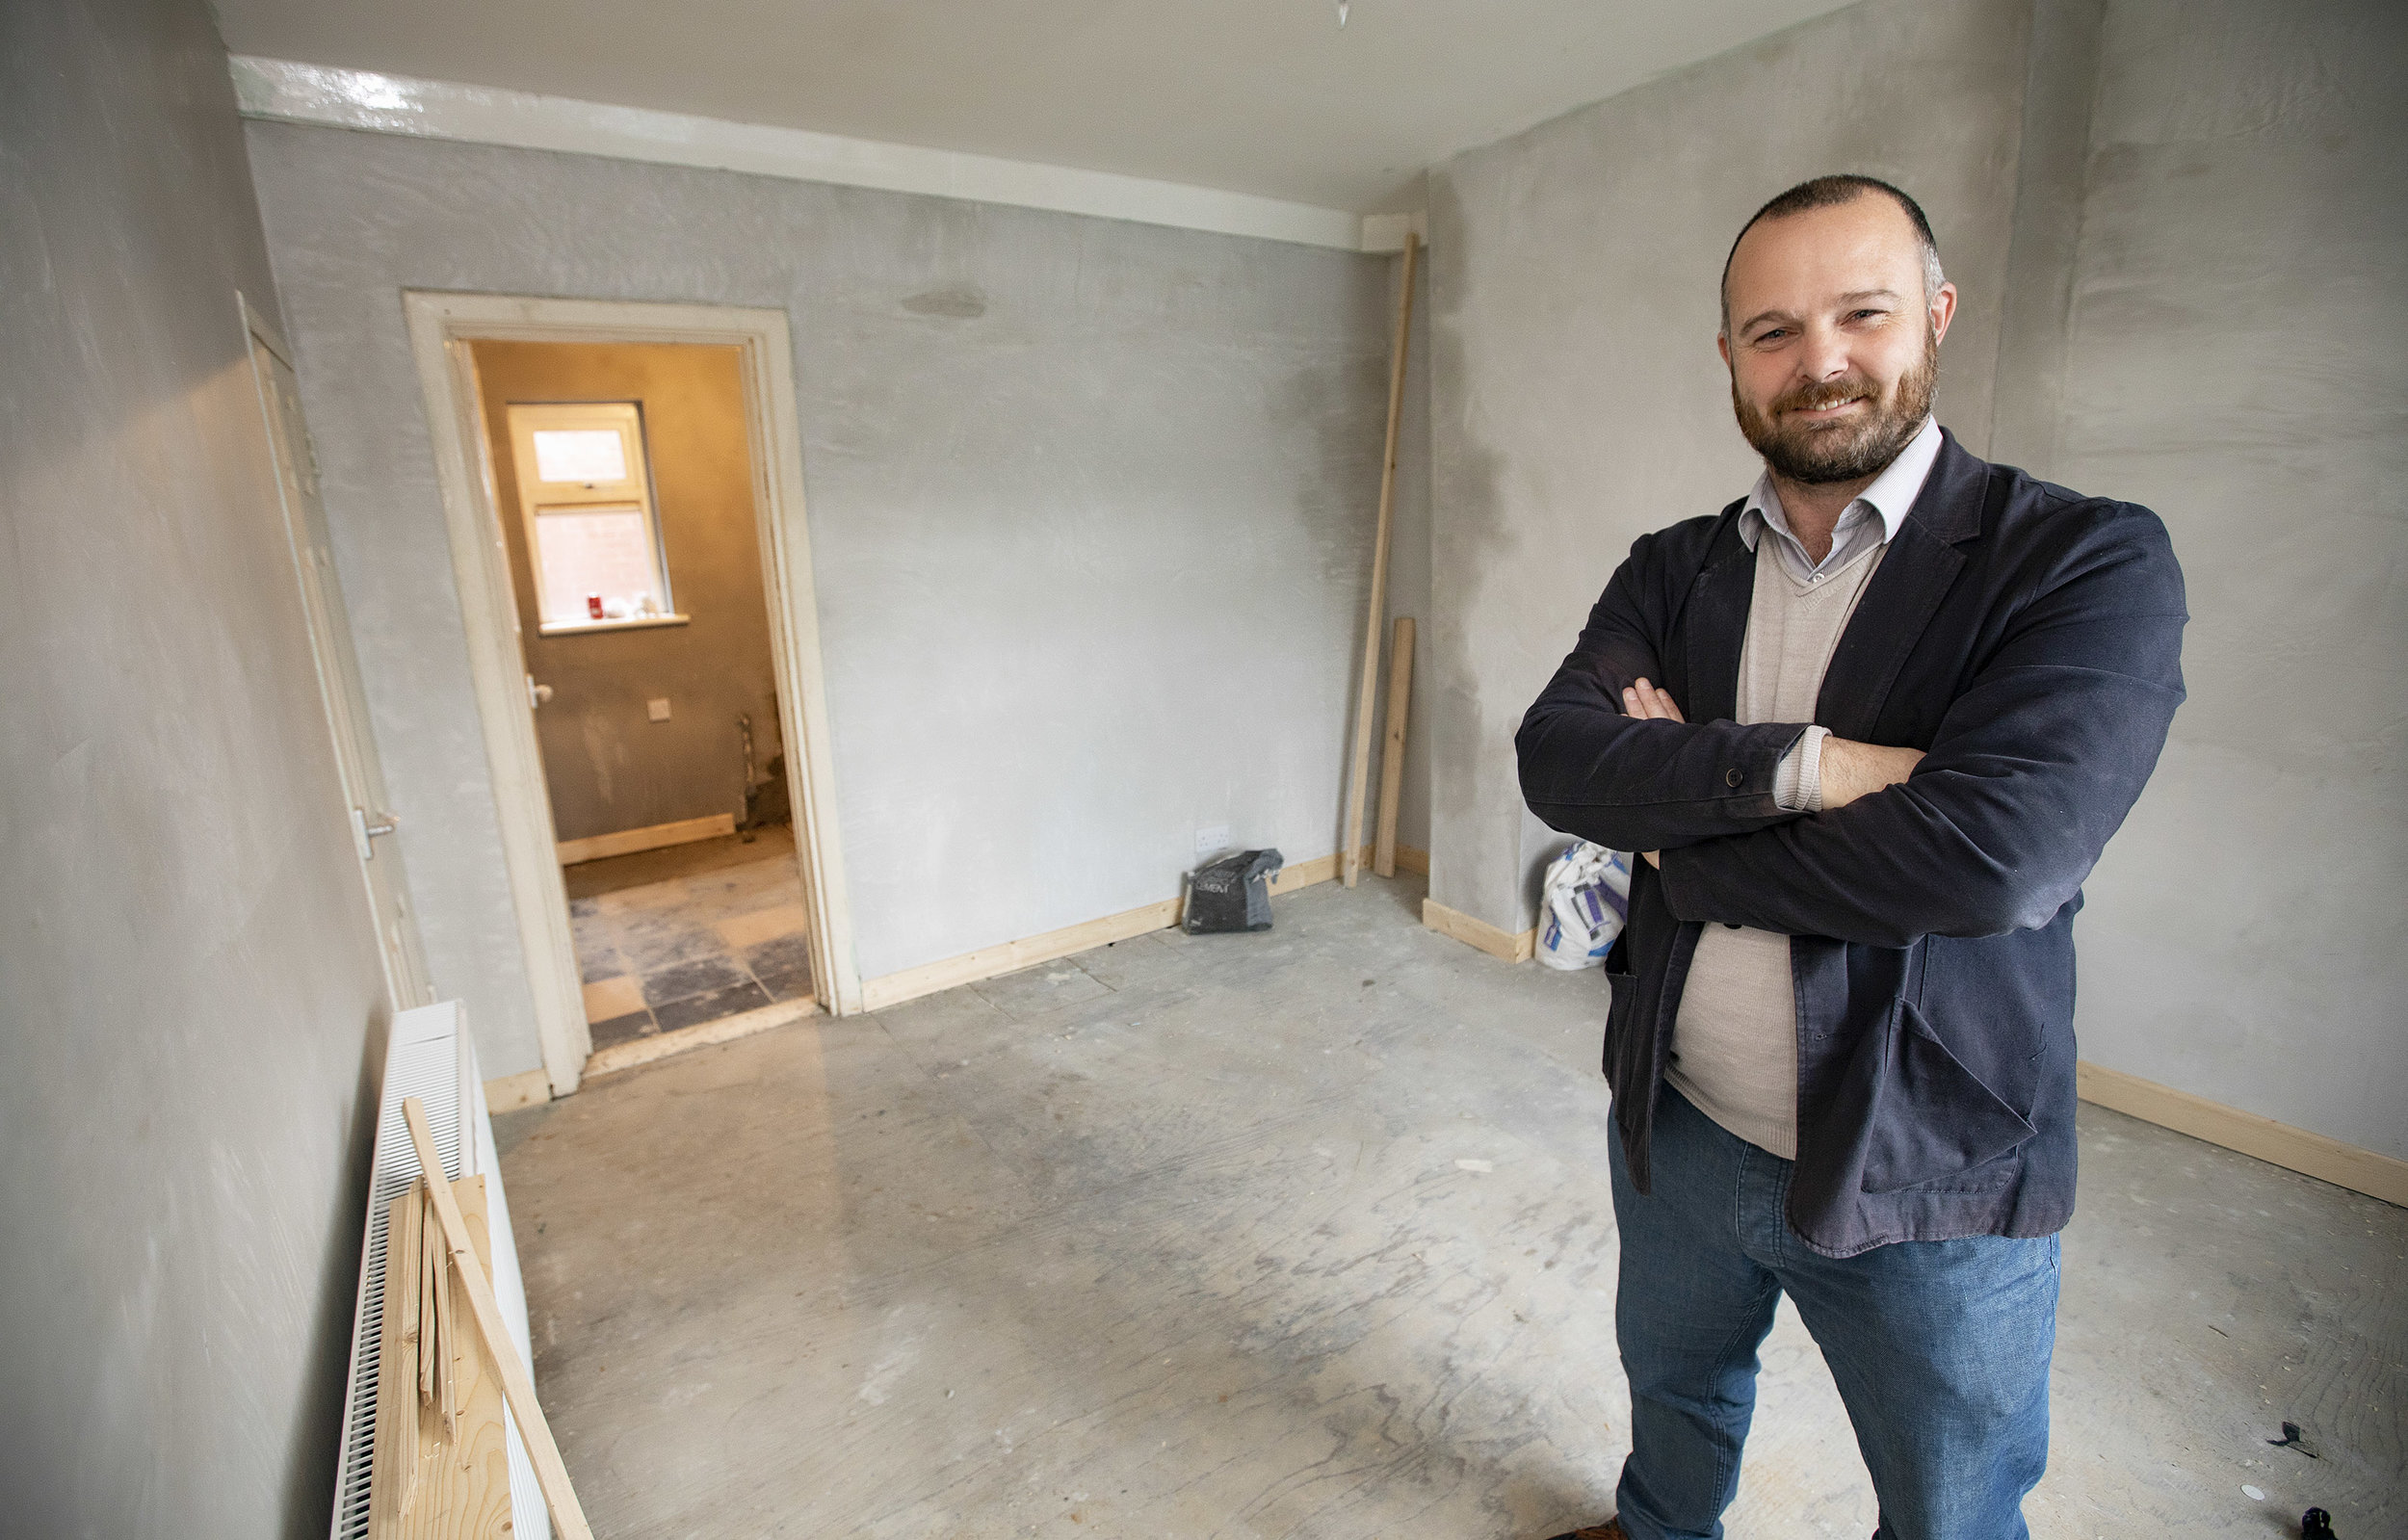 Declan Morris in a new Extern Home